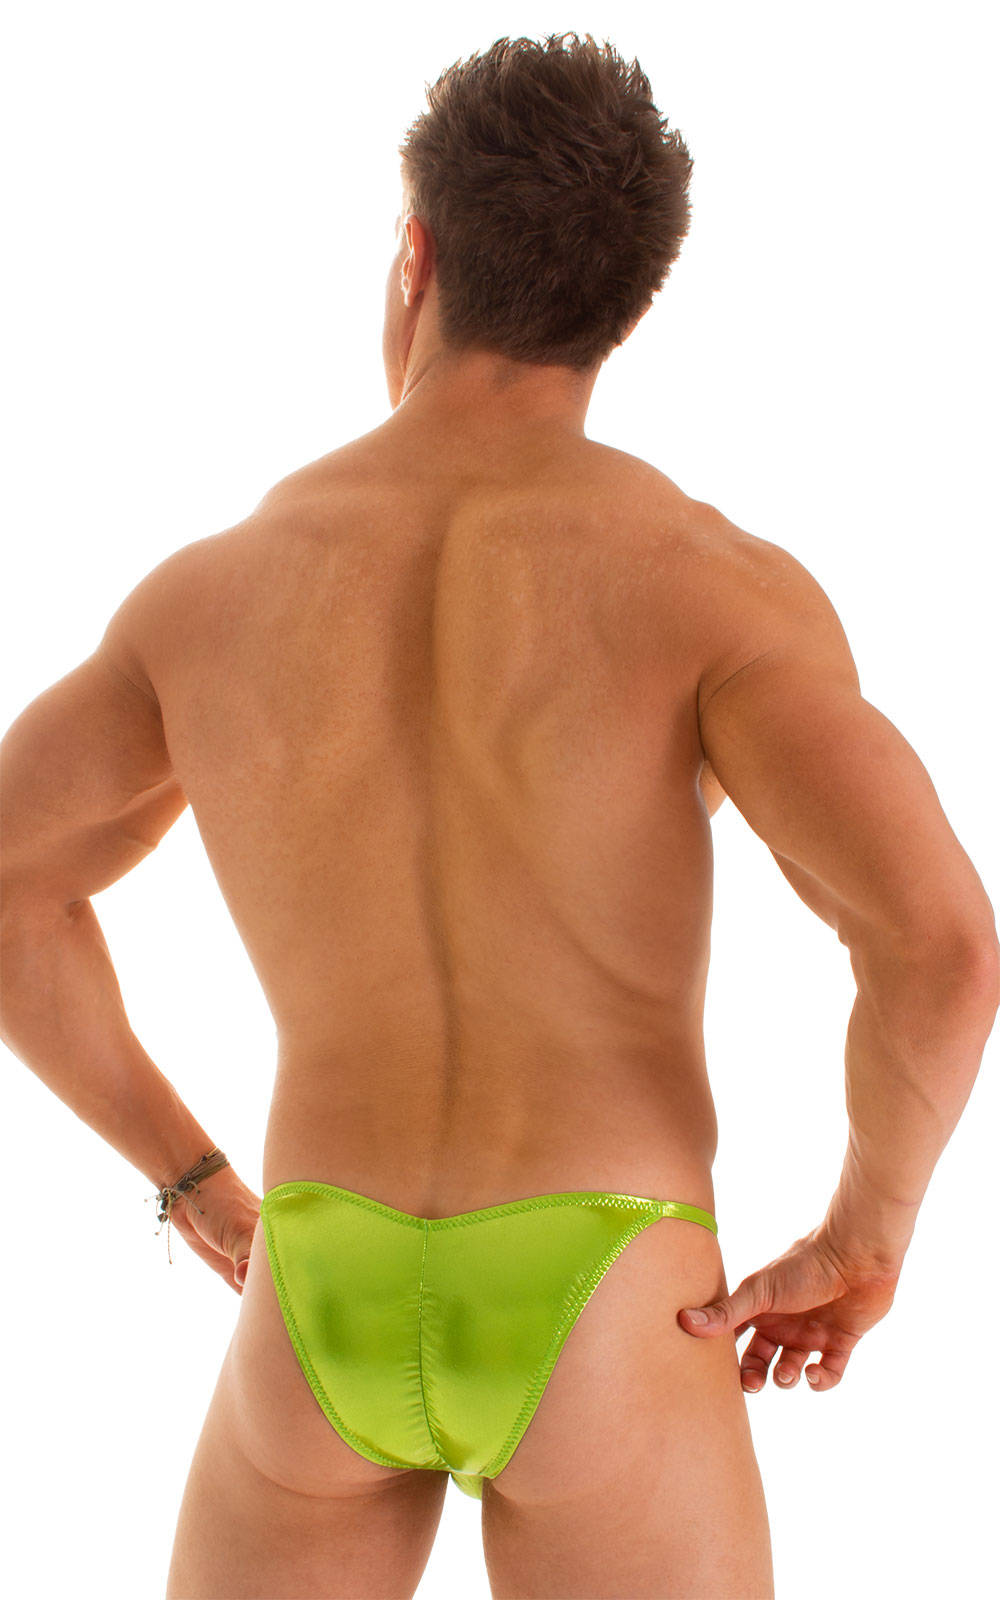 Micro Pouch - Puckered Back - Rio Bikini in Ice Karma Lemon-Line 2